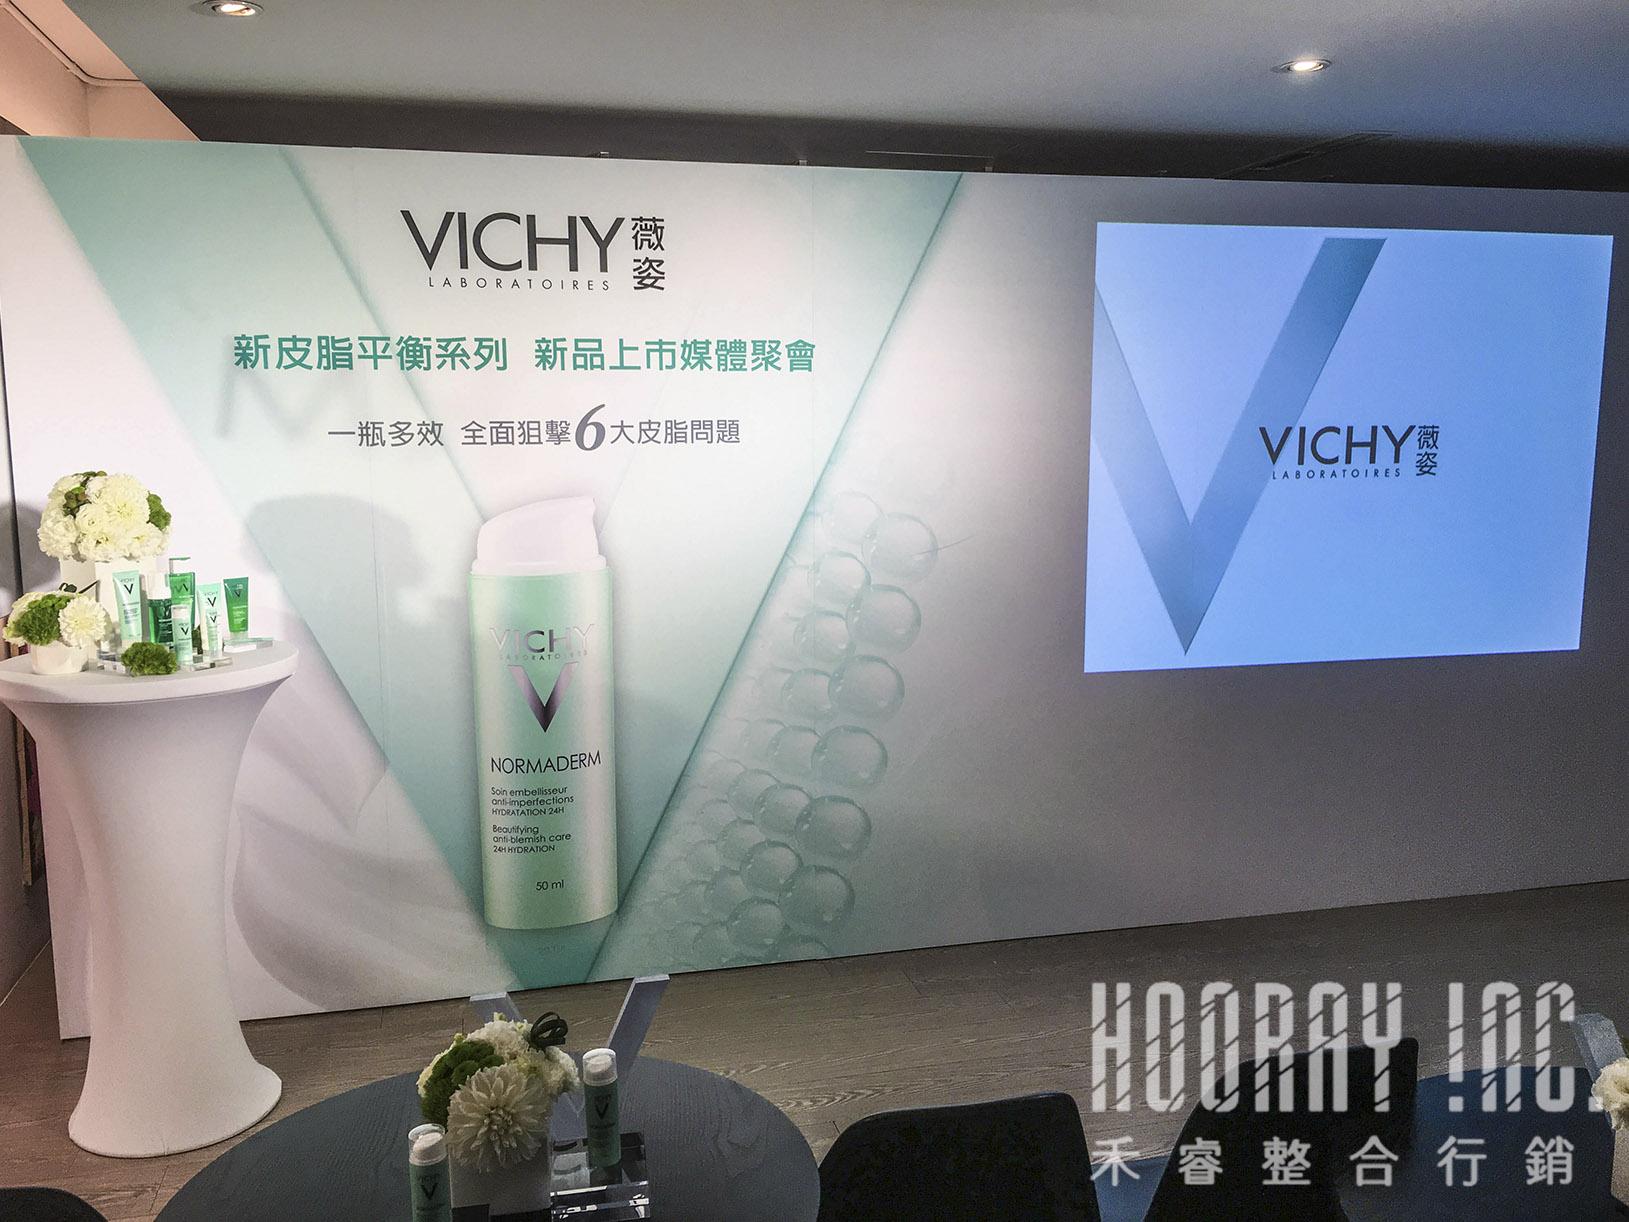 VICHY | 新品上市記者會